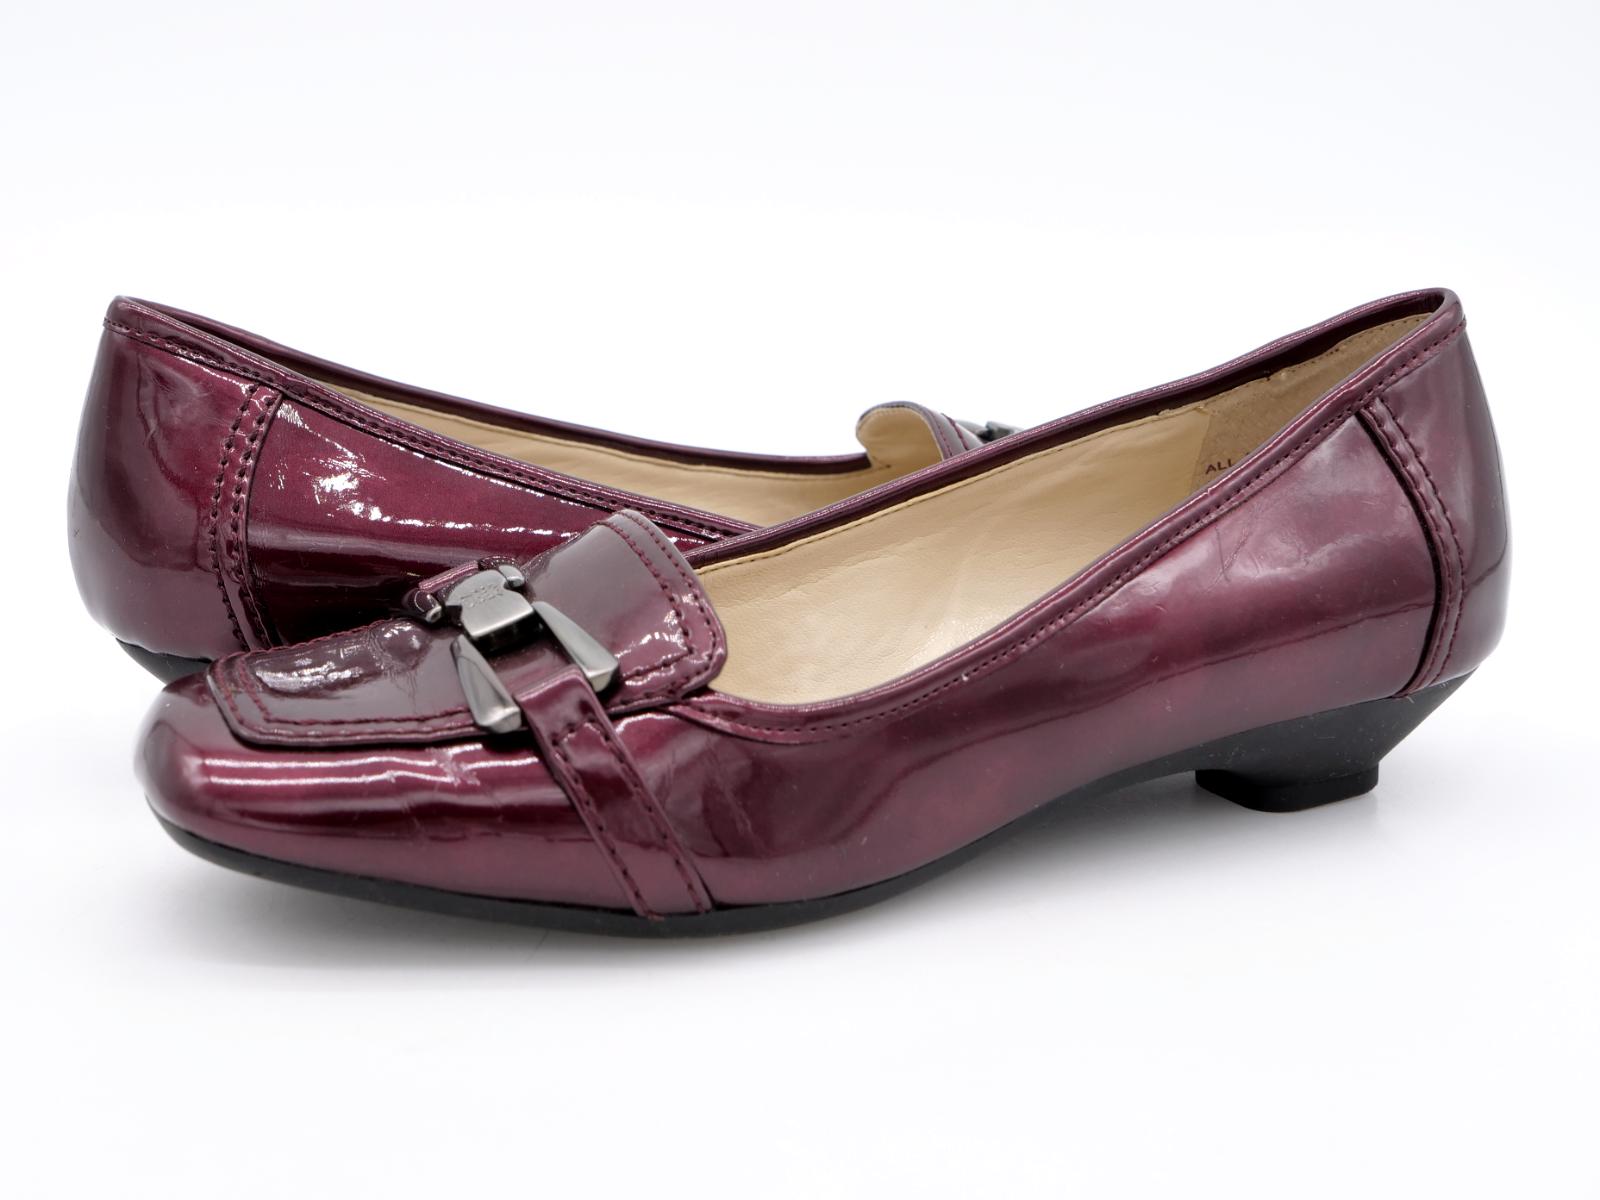 Anne Klein Womens 6.5M Justine Burgundy Square Moc Toe Slip On Cone Pump Heels - $19.99